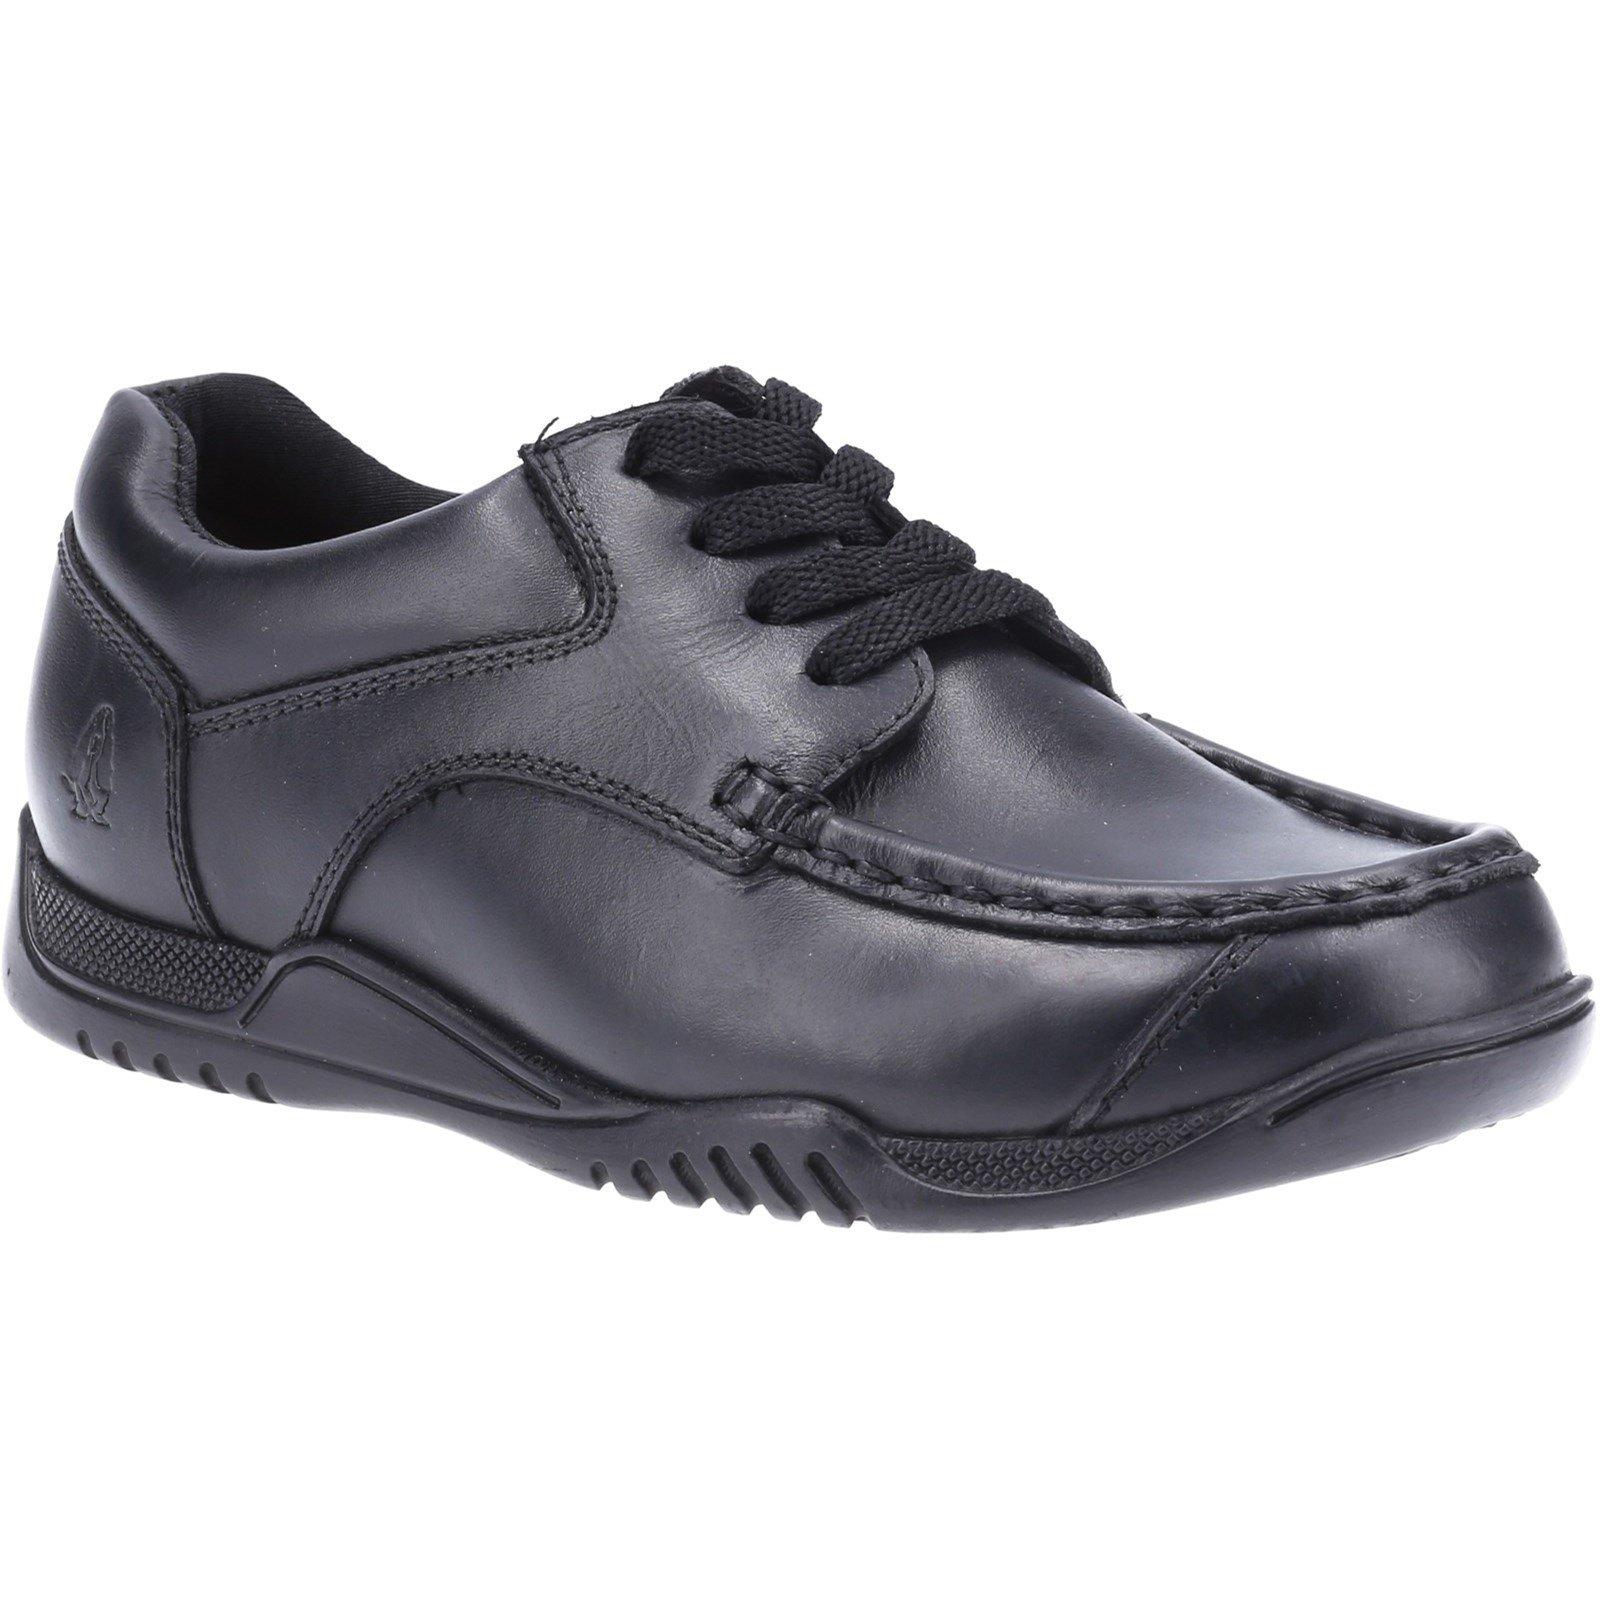 Hush Puppies Kid's Hudson Junior School Shoe Black 32582 - Black 12